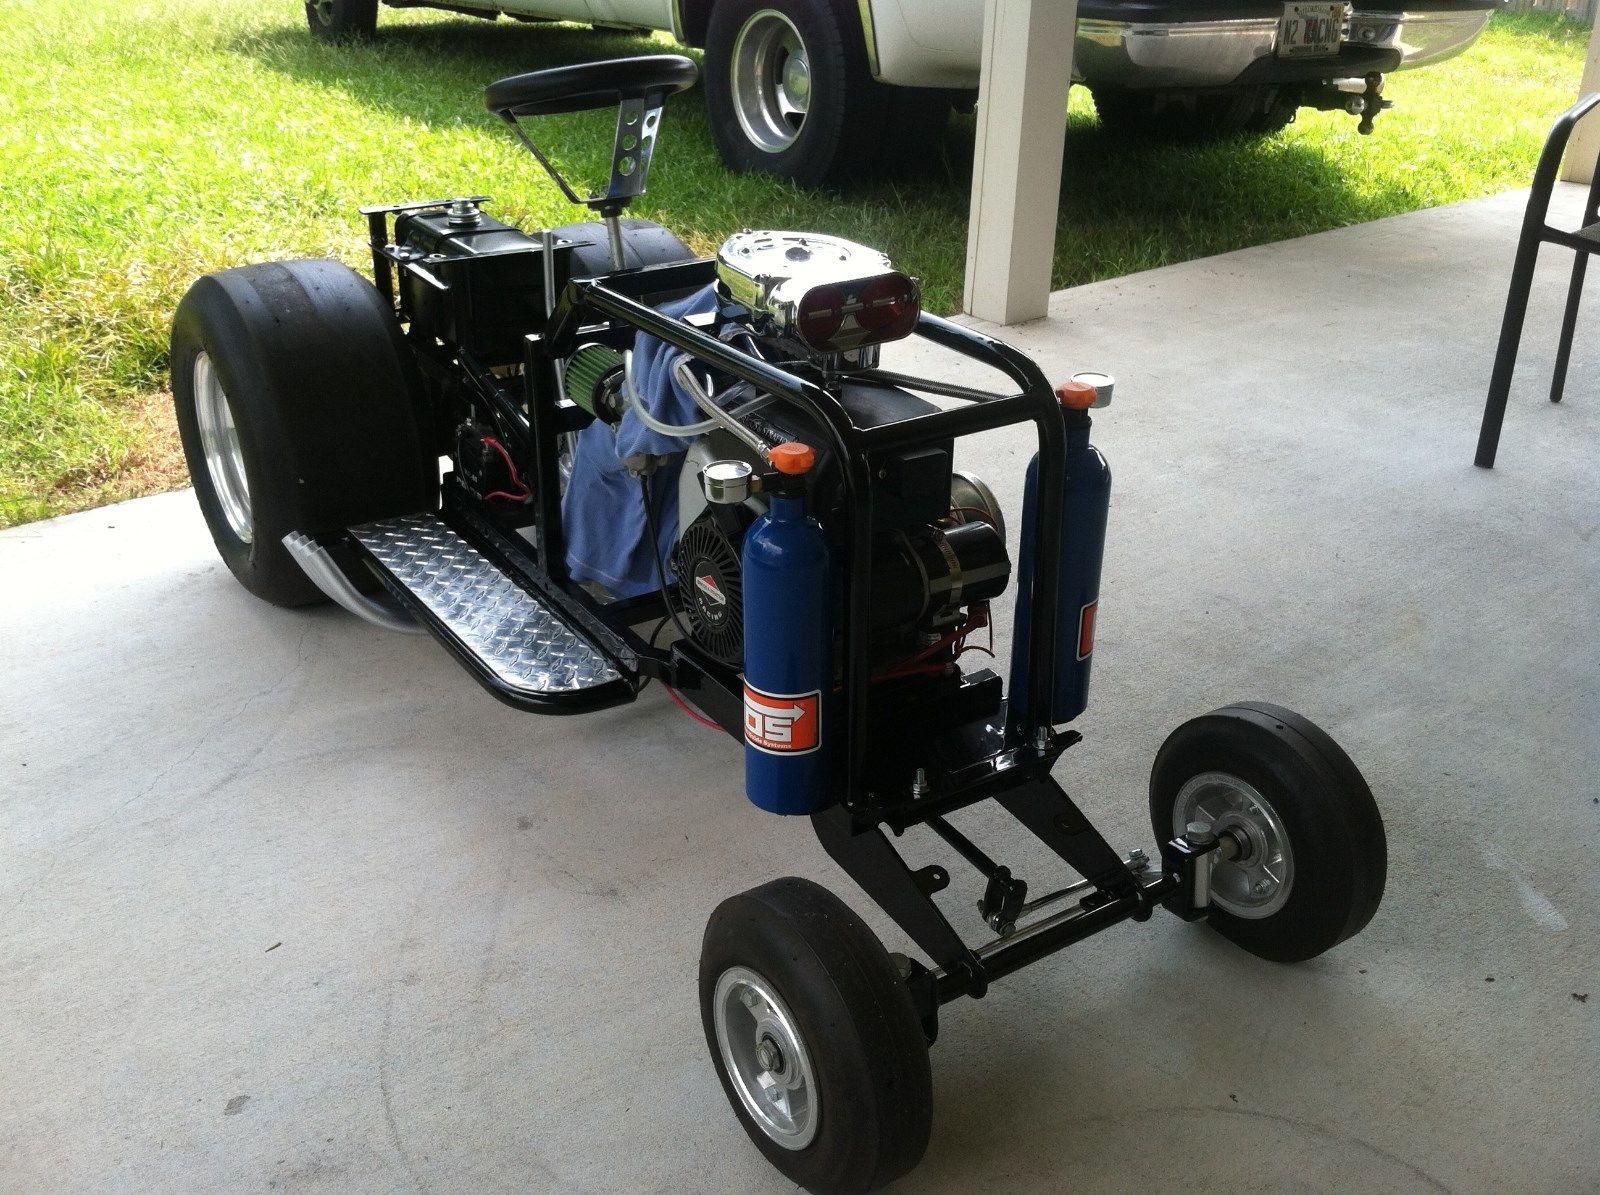 Custom Racing Tractors : Bangshift pro street lawn mower